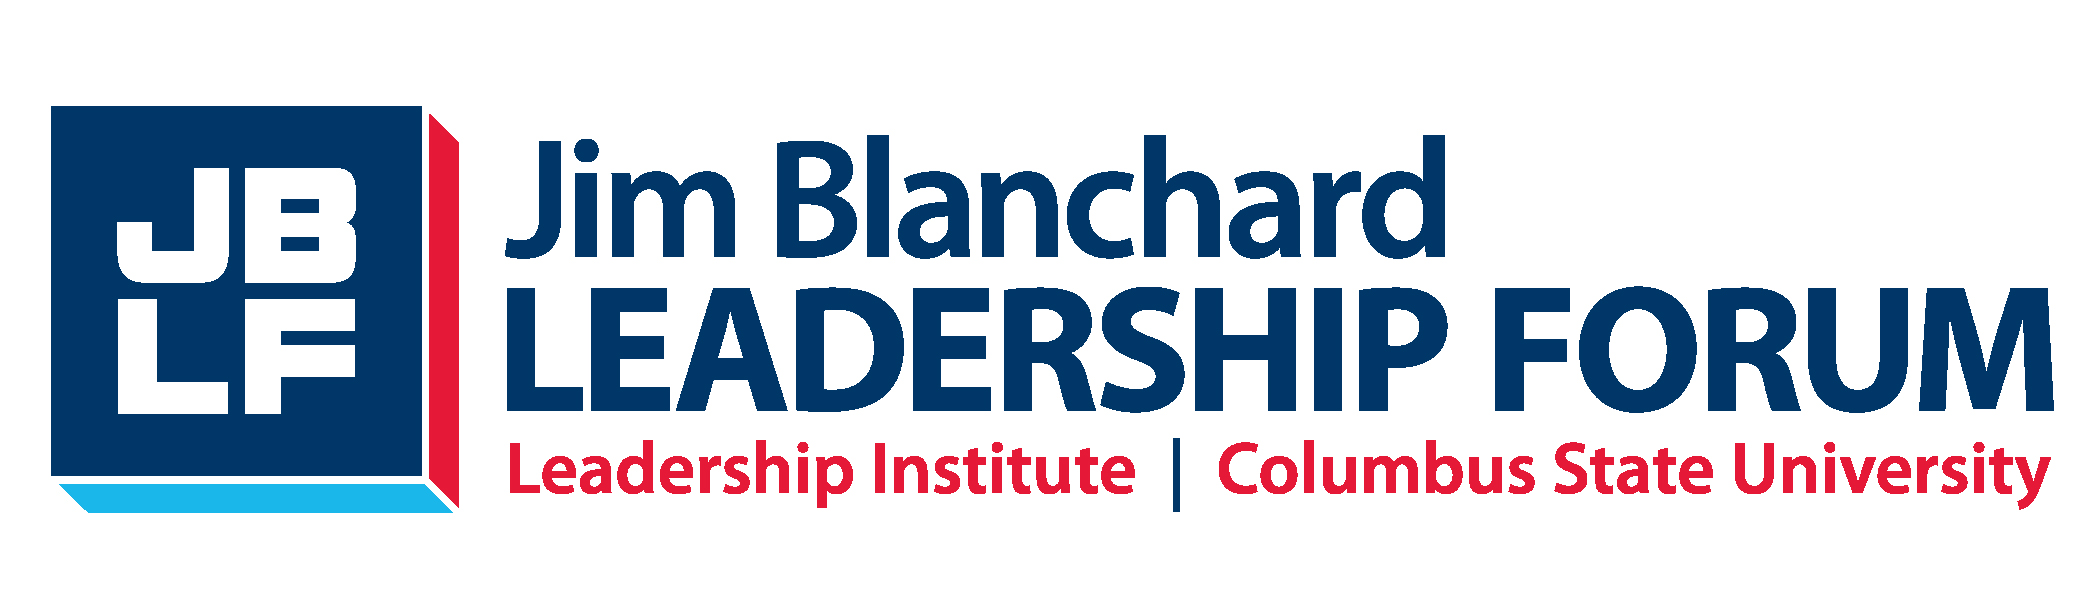 Jim Blanchard Leadership Forum